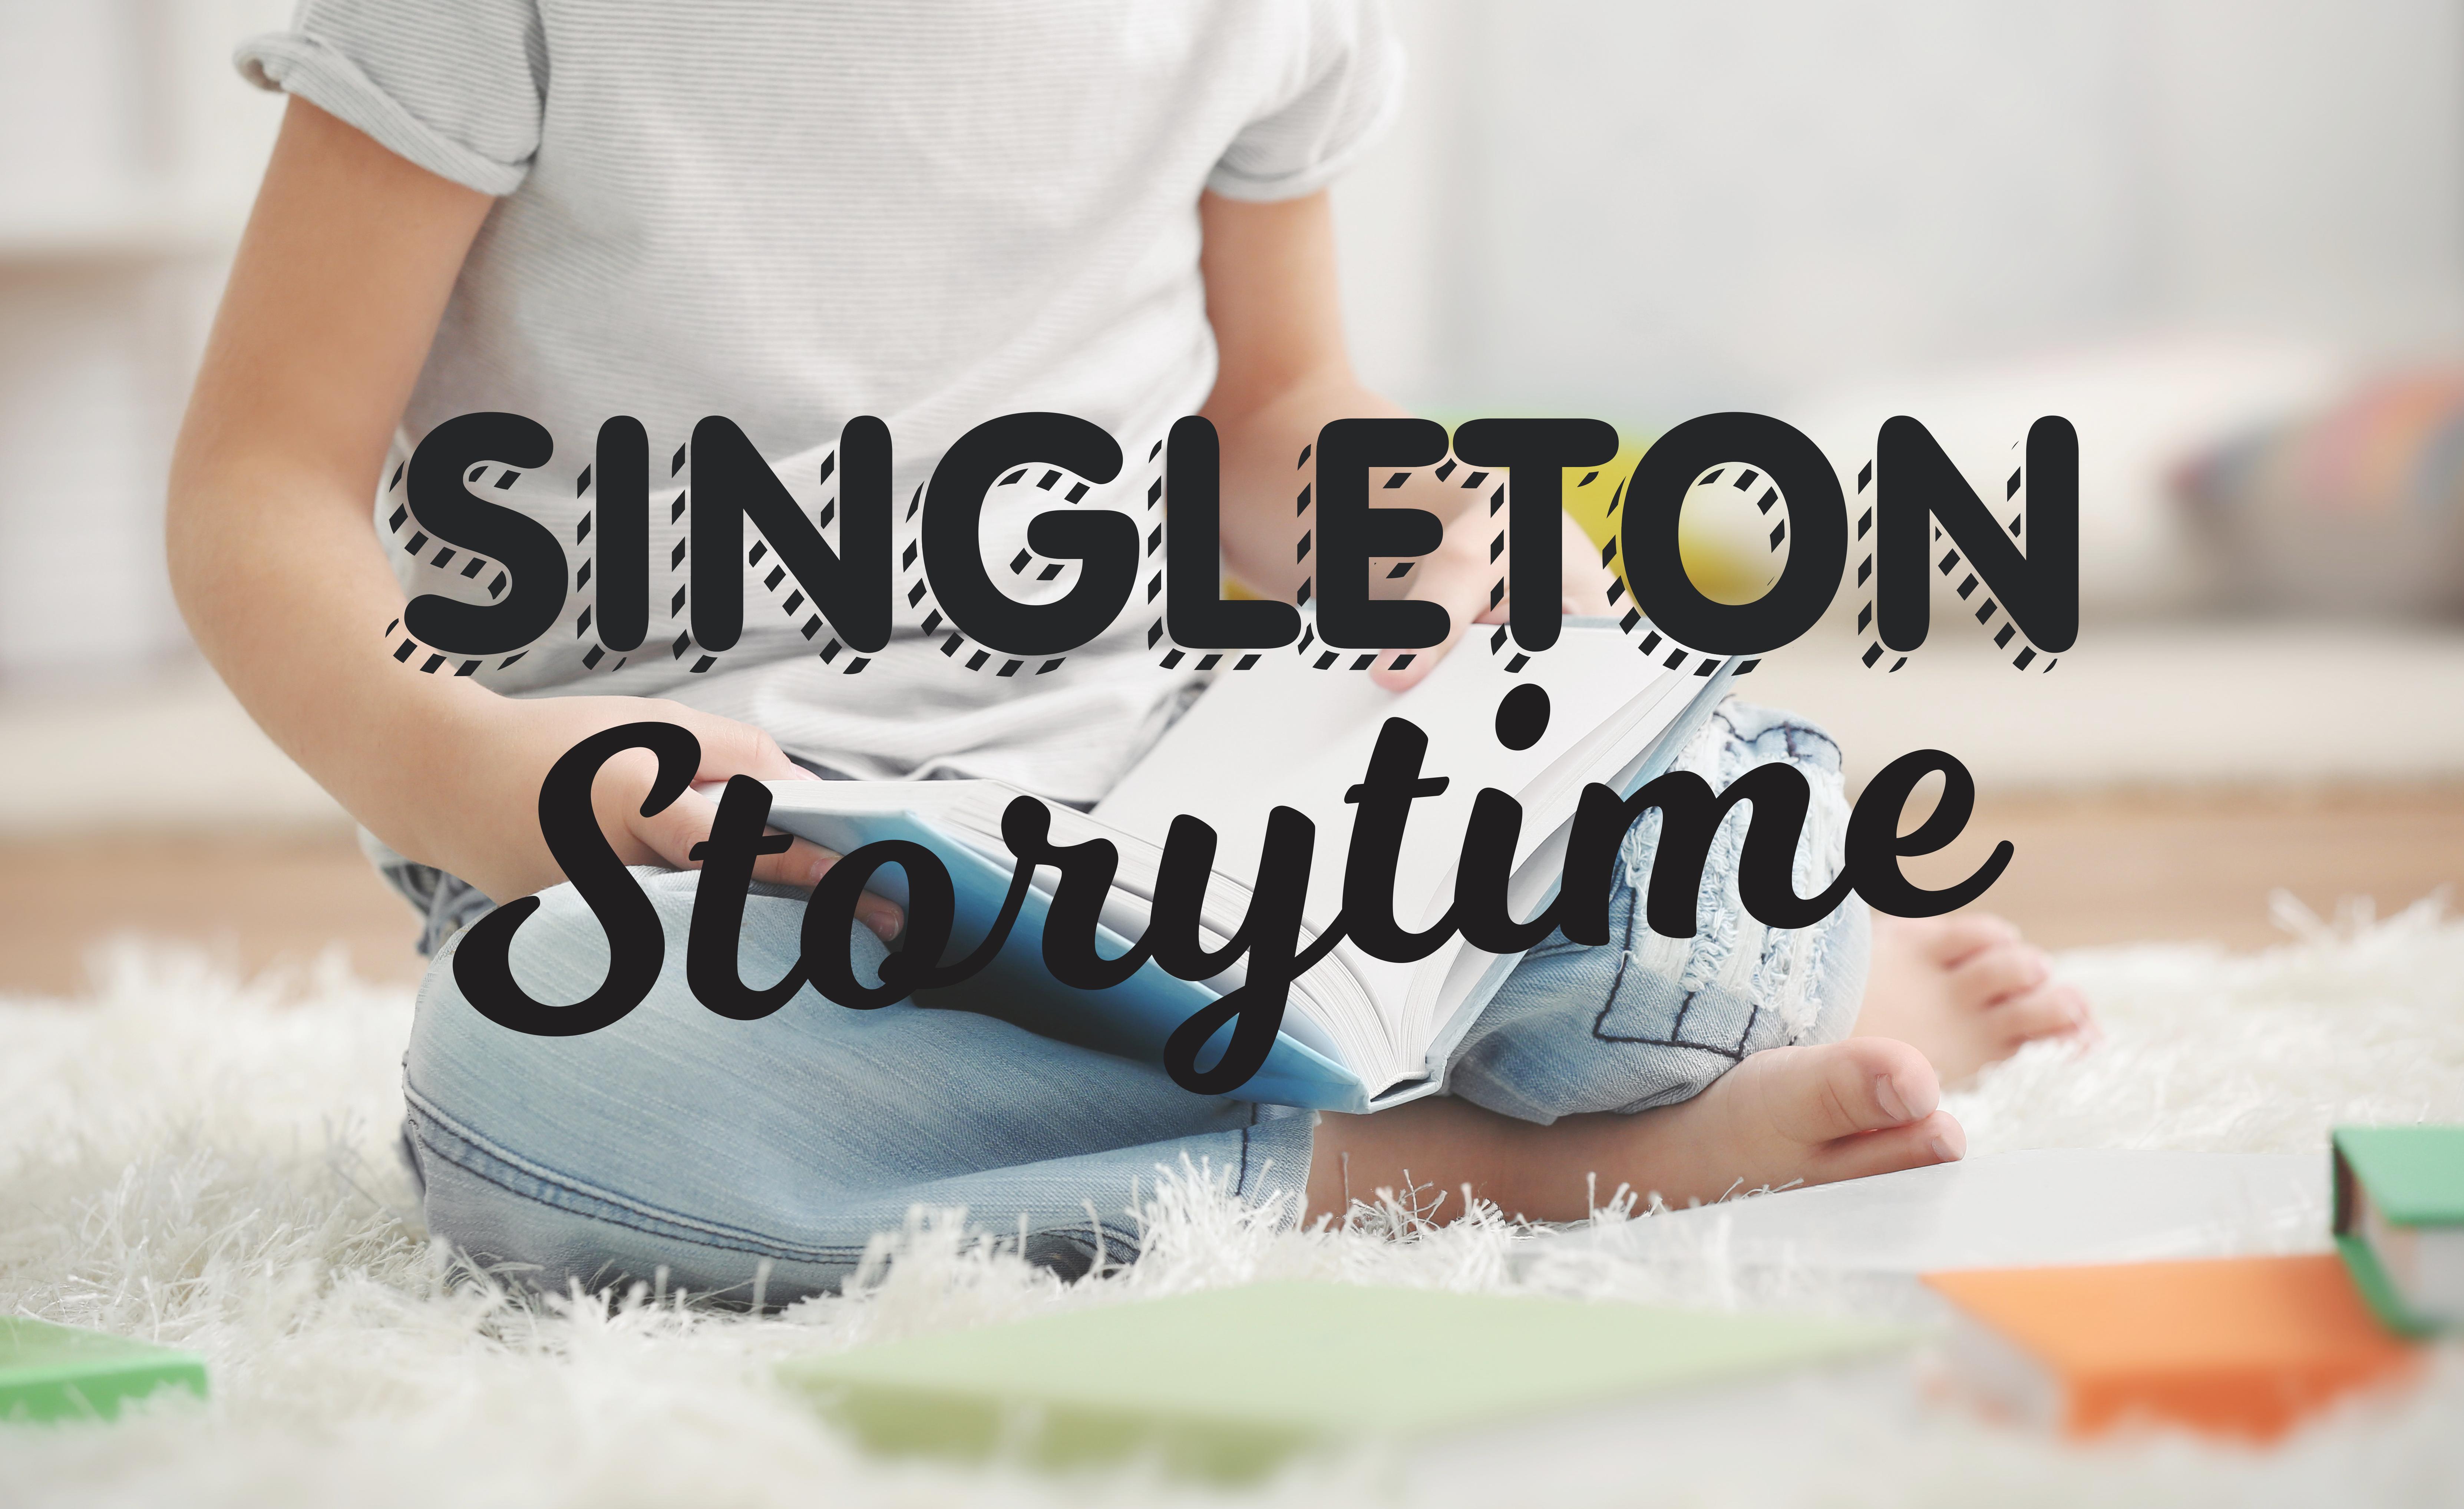 CH_SingletonSq_Storytime_844_x_517